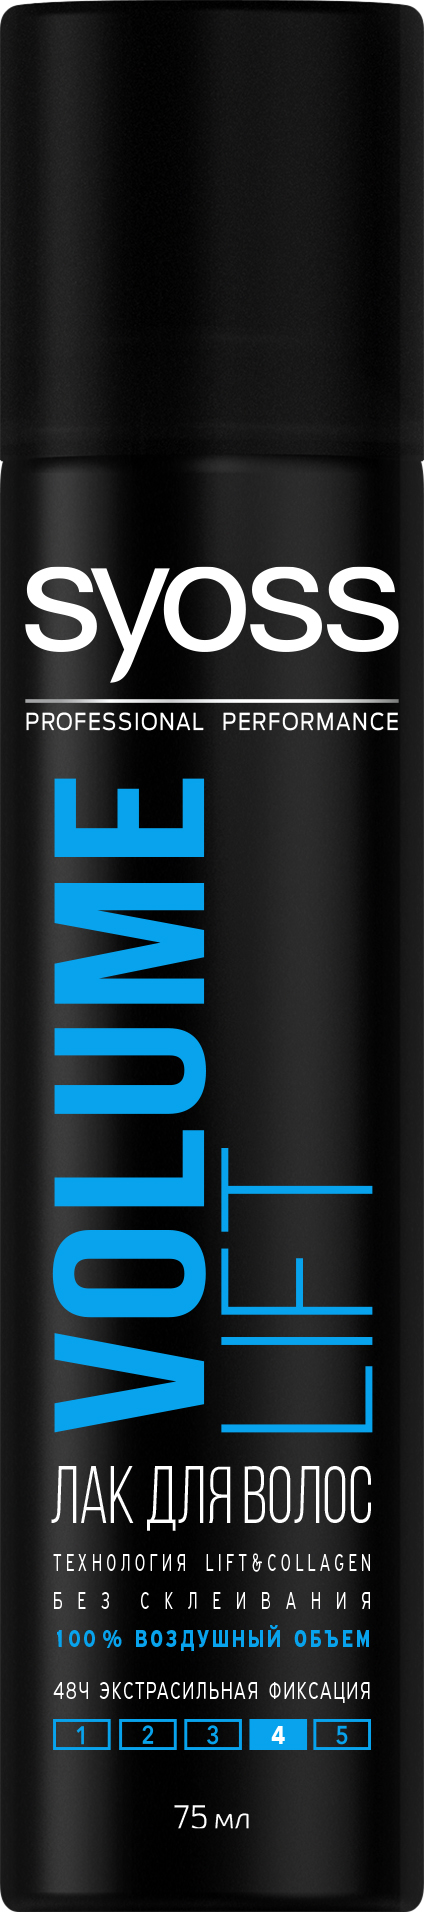 SYOSS Лак Volume Lift экстрасильной фиксации , 75 мл syoss syoss лак для волос volume lift 75 мл